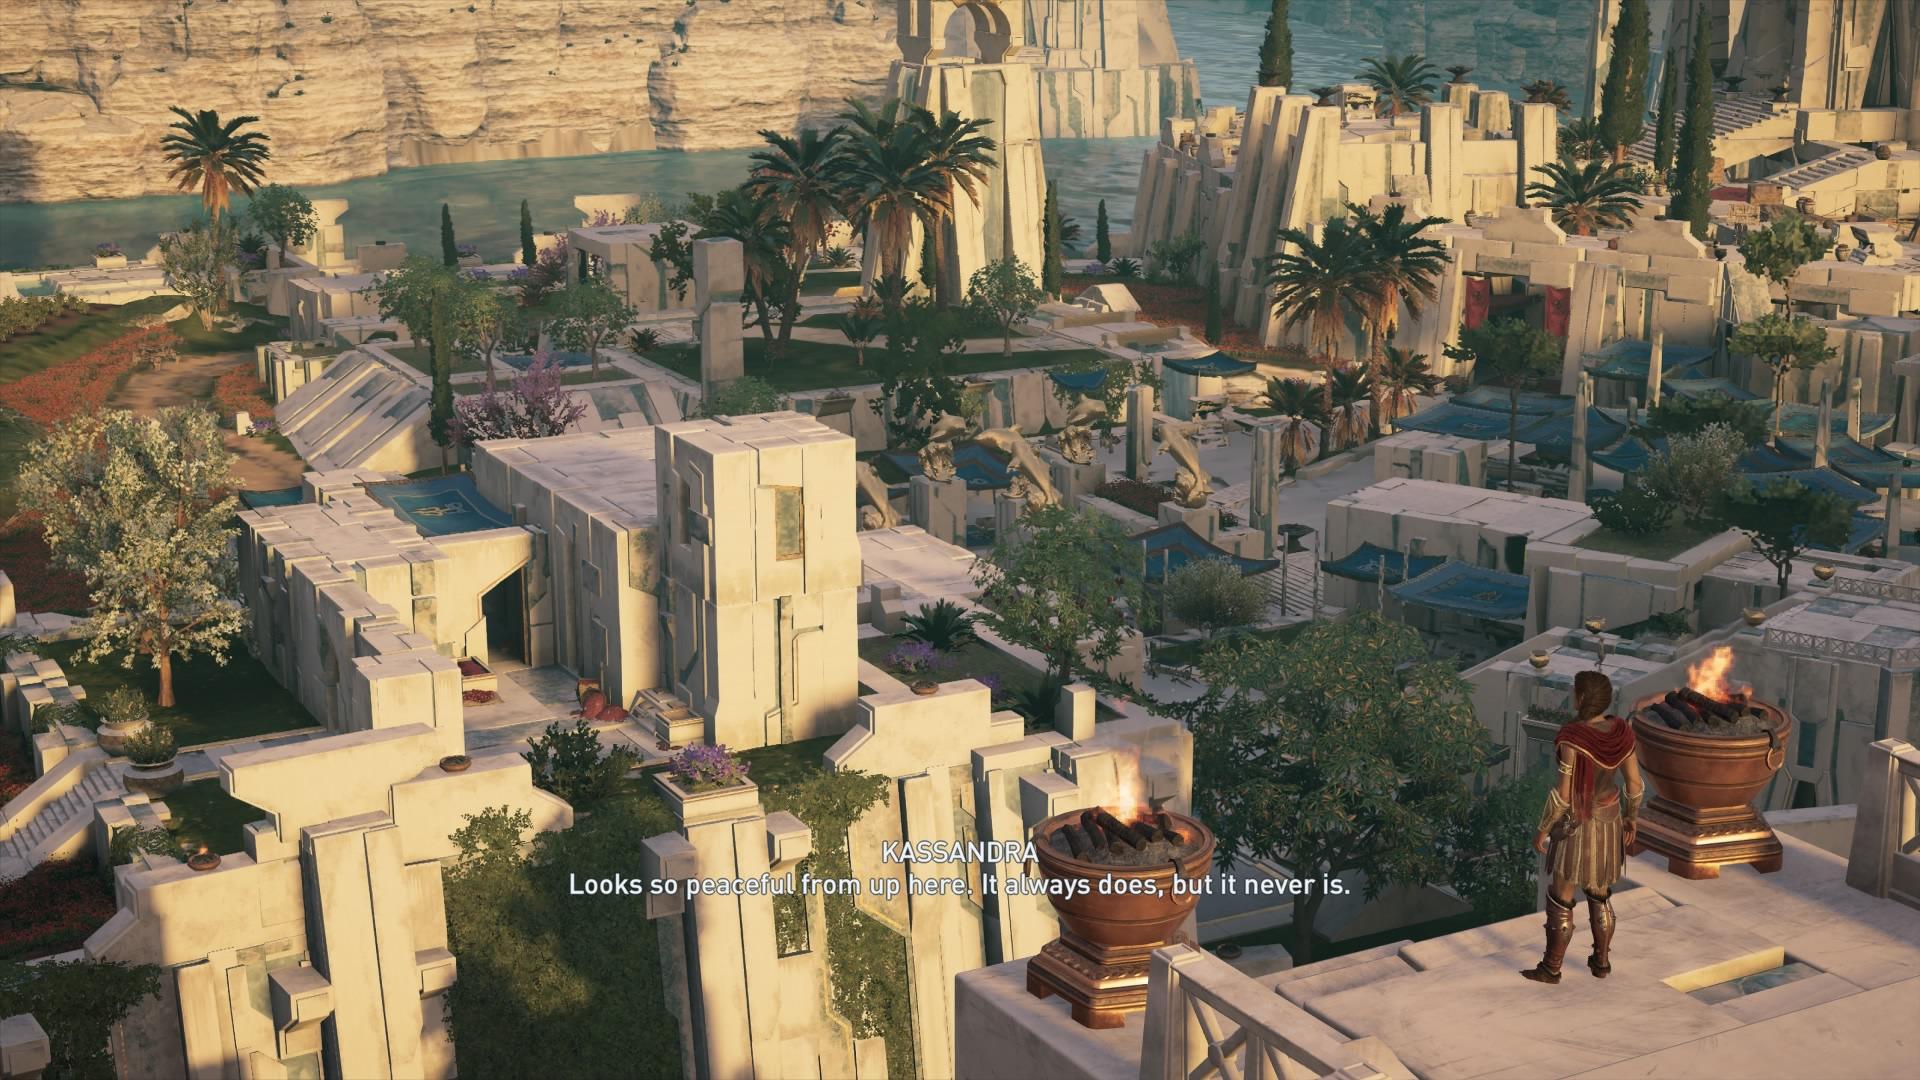 Fate of Atlantis summary